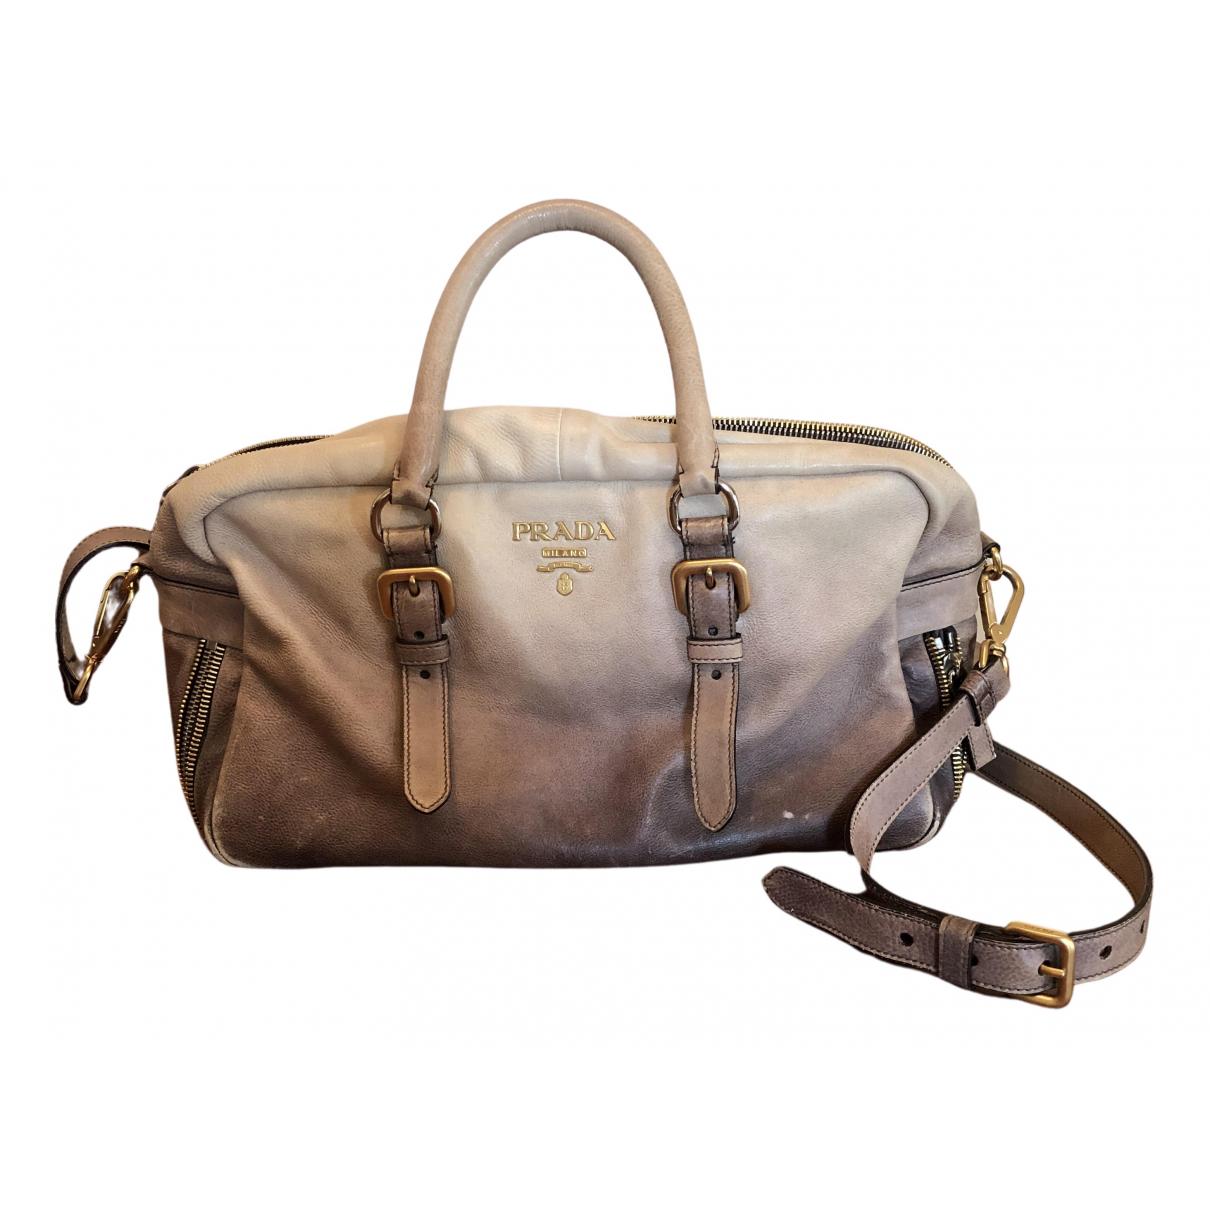 Prada N Beige Leather handbag for Women N